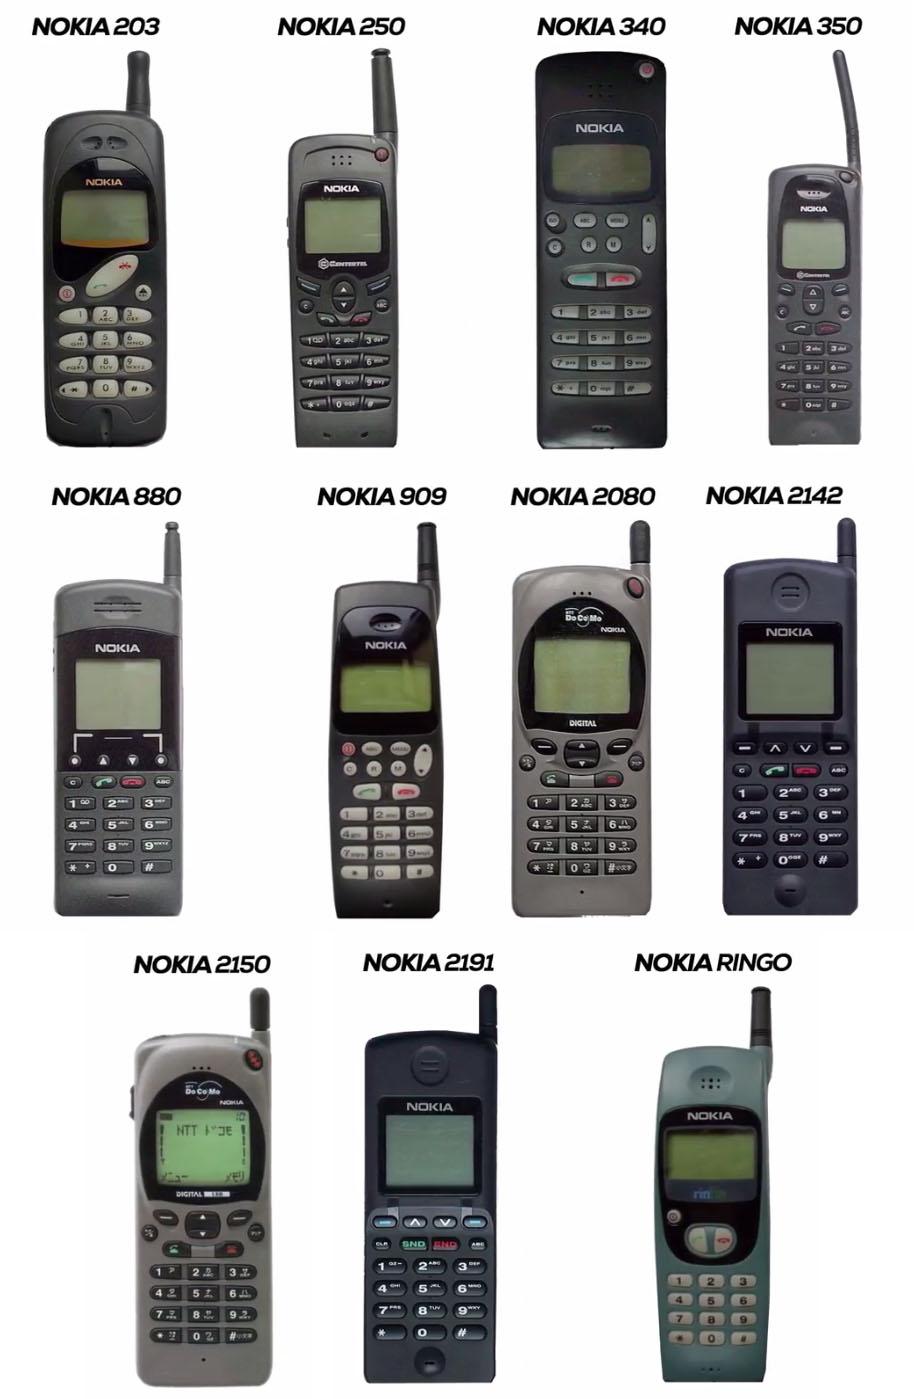 Nokia Mobile Phones in 1995